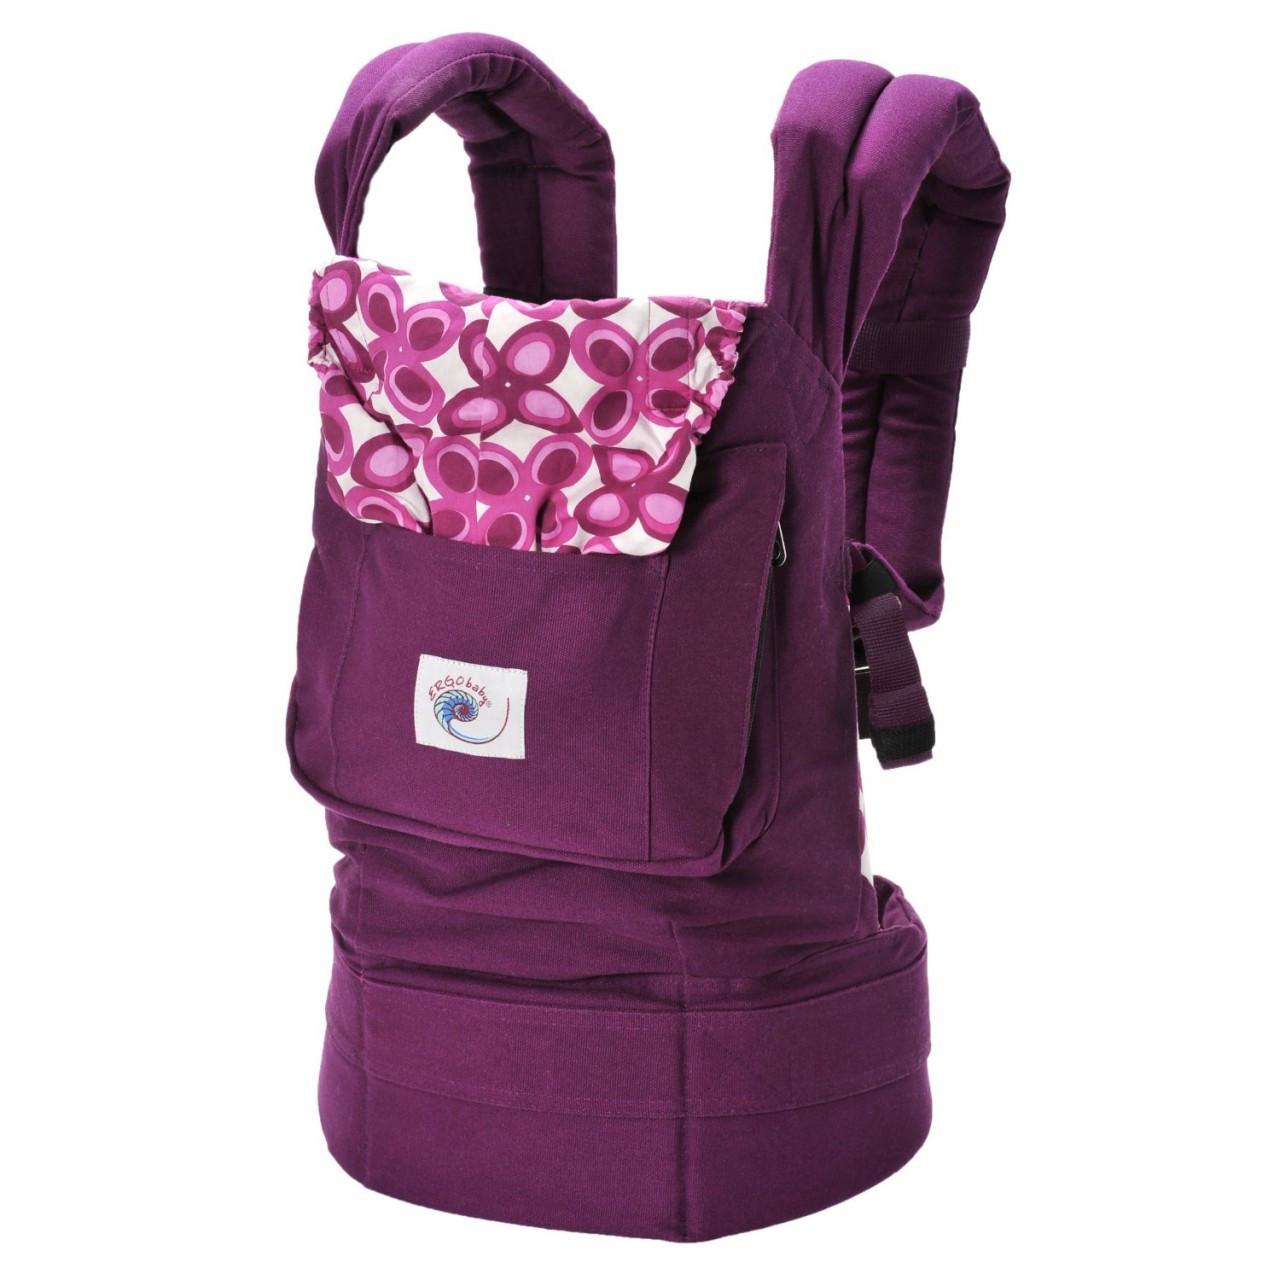 1113dc3c273 ... Ergo Baby Carrier - Purple Mystic. Image 1